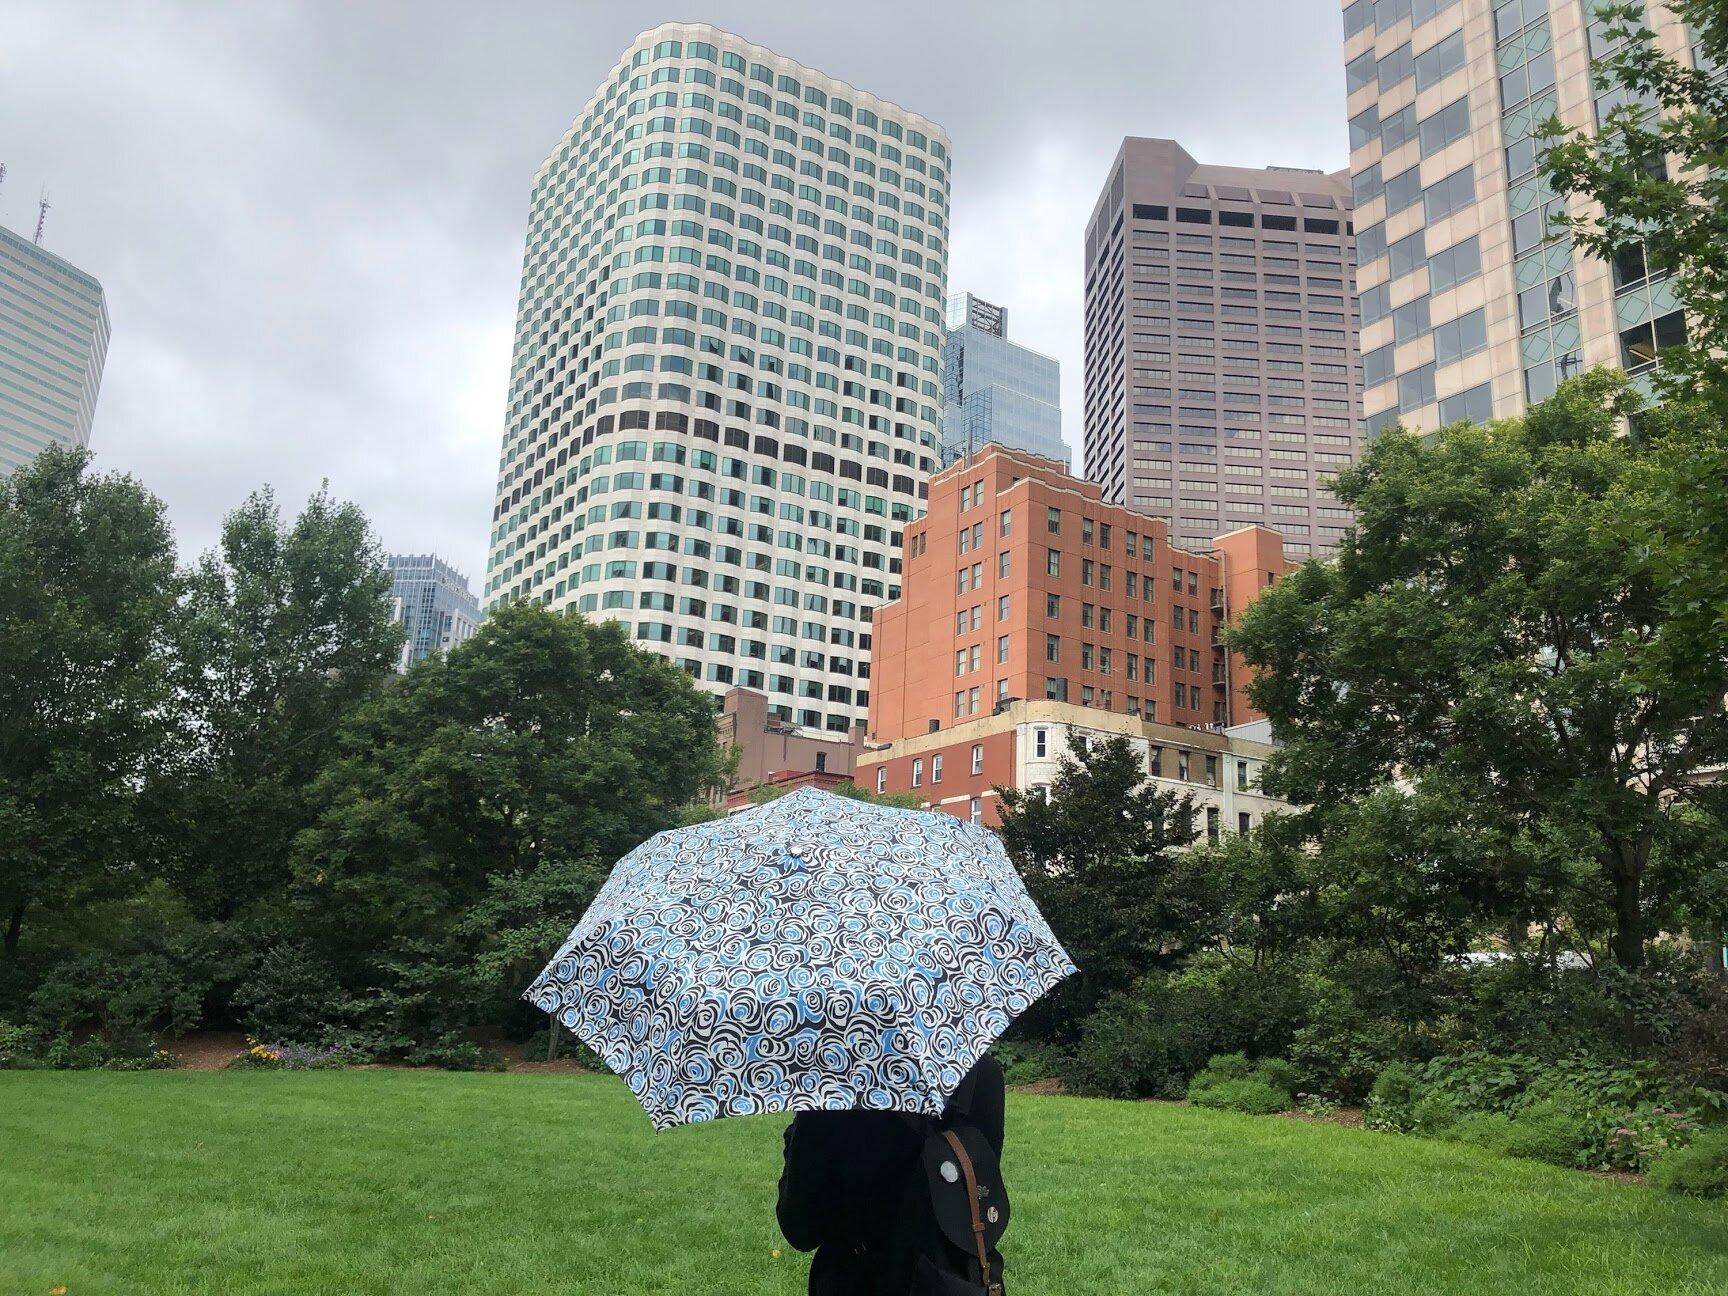 Needing an umbrella at the Rose Kennedy Greenway